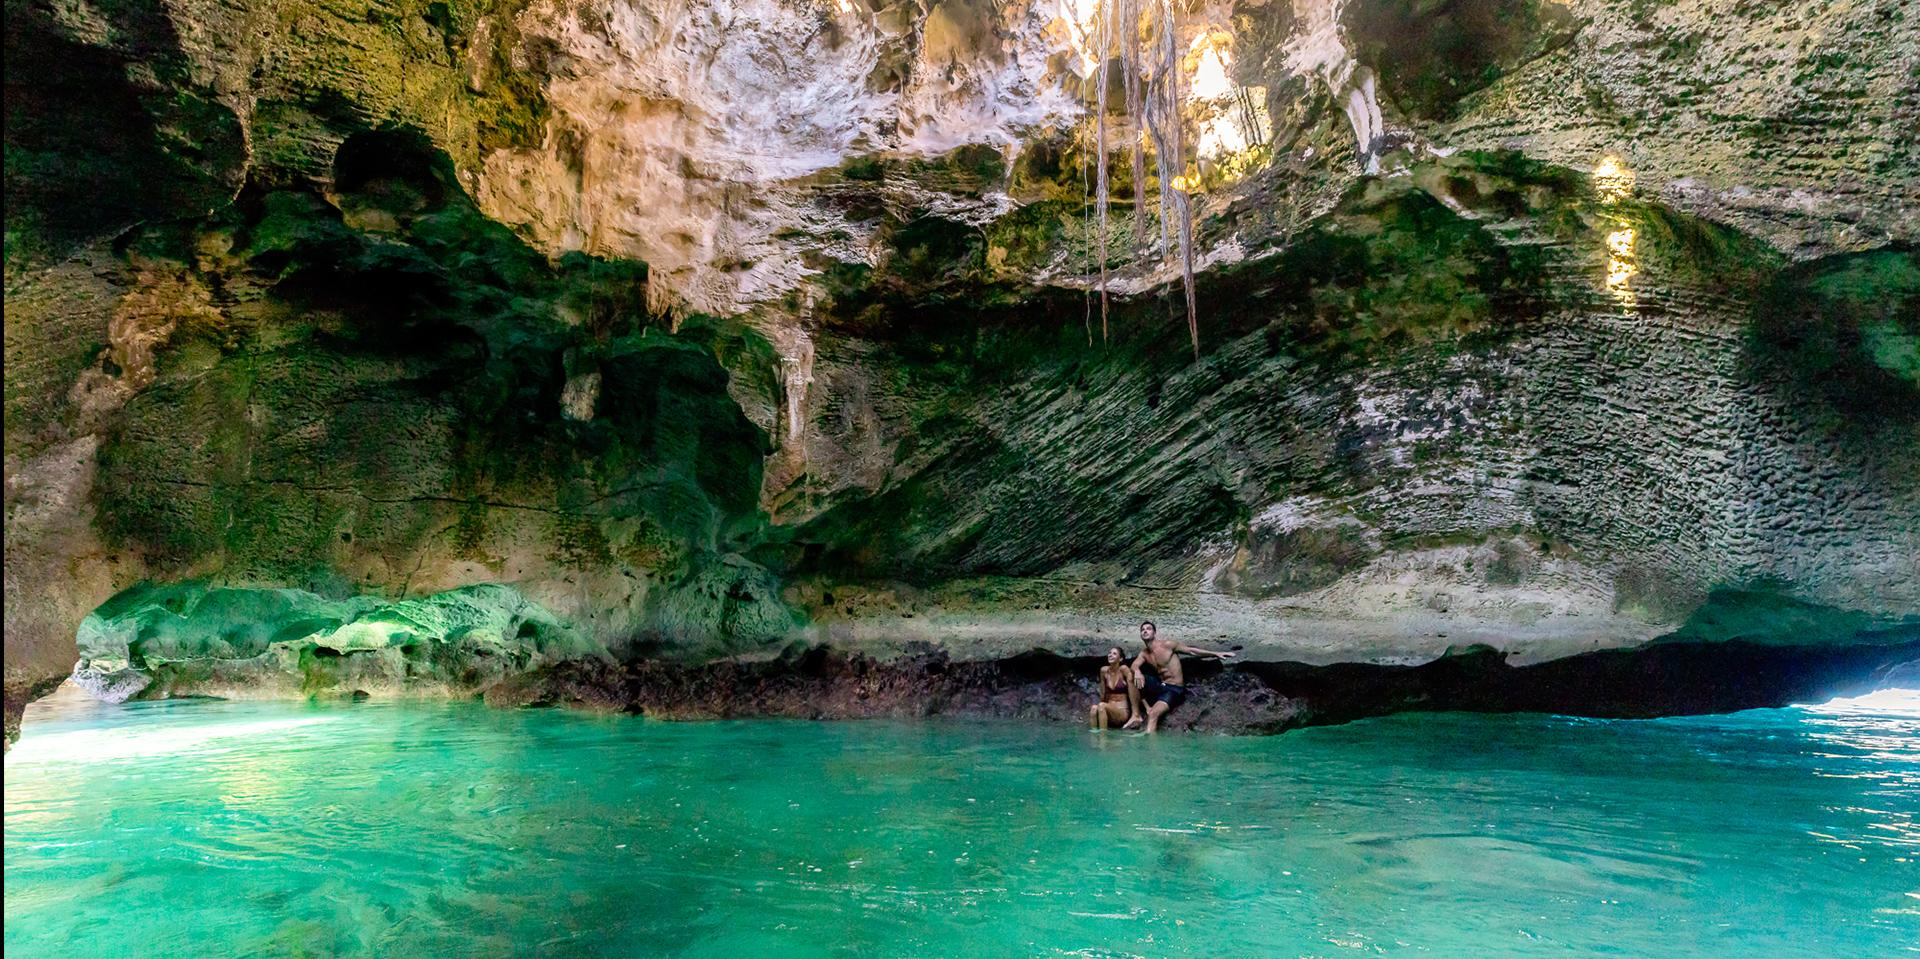 couple inside a beautiful cave